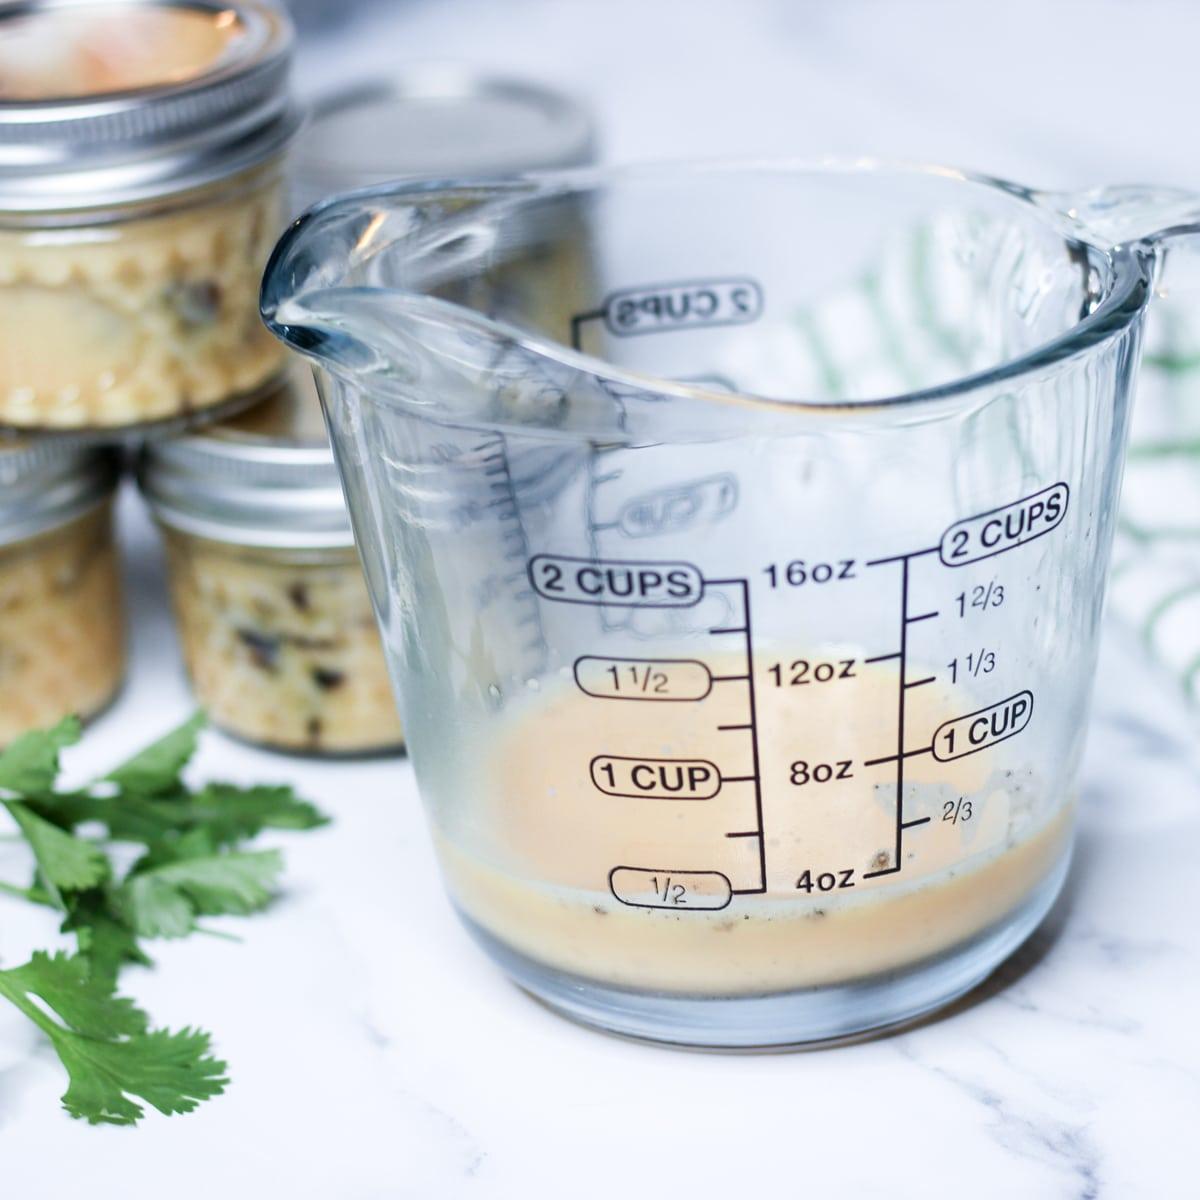 whisked egg for sous vide egg bites in measuring cup